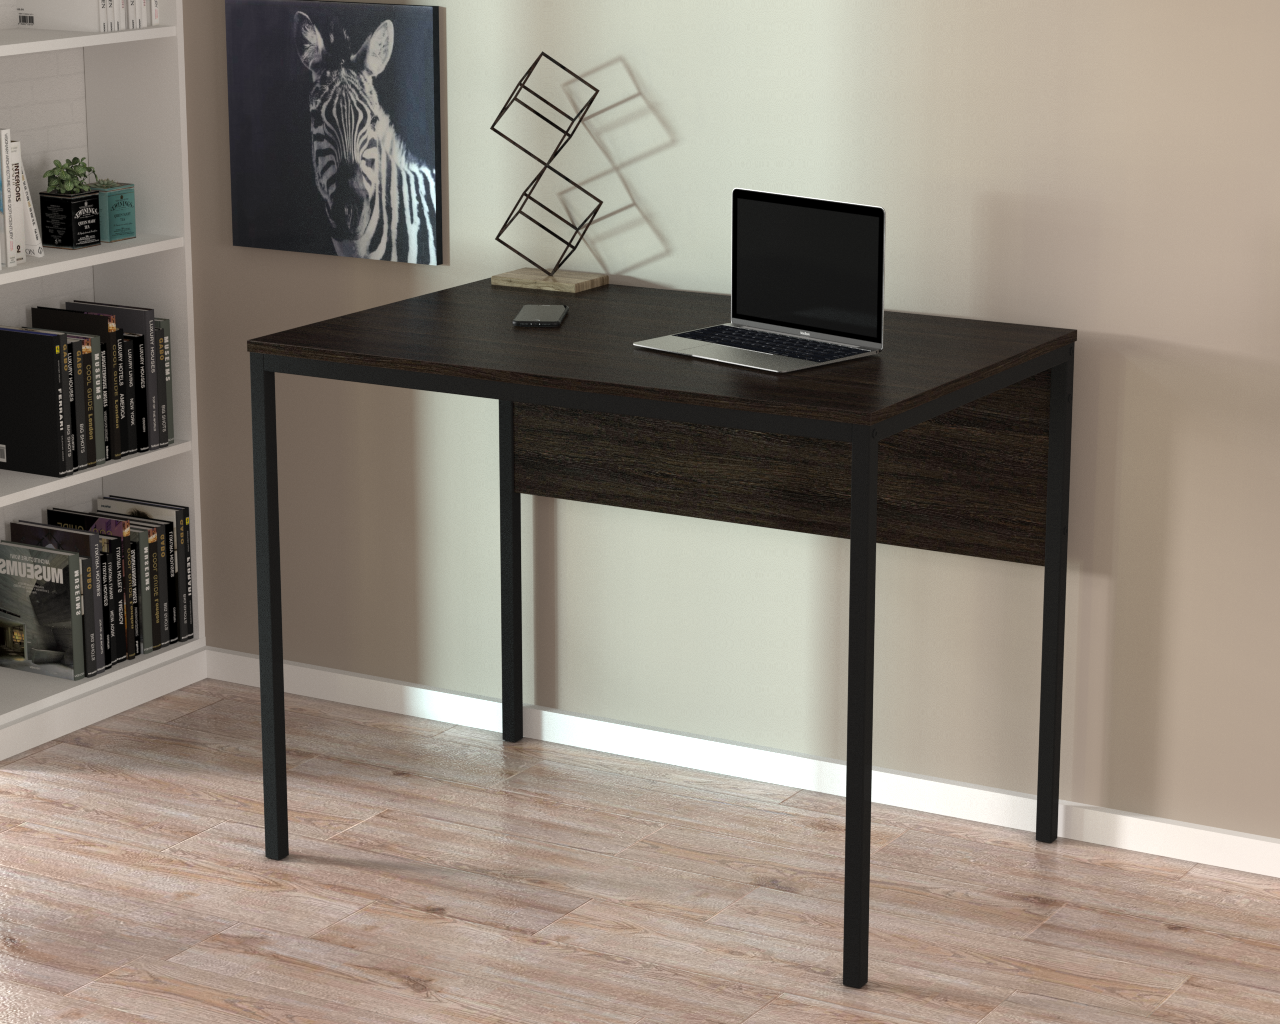 Письменный стол Loft-design L-2p mini, металл+дсп